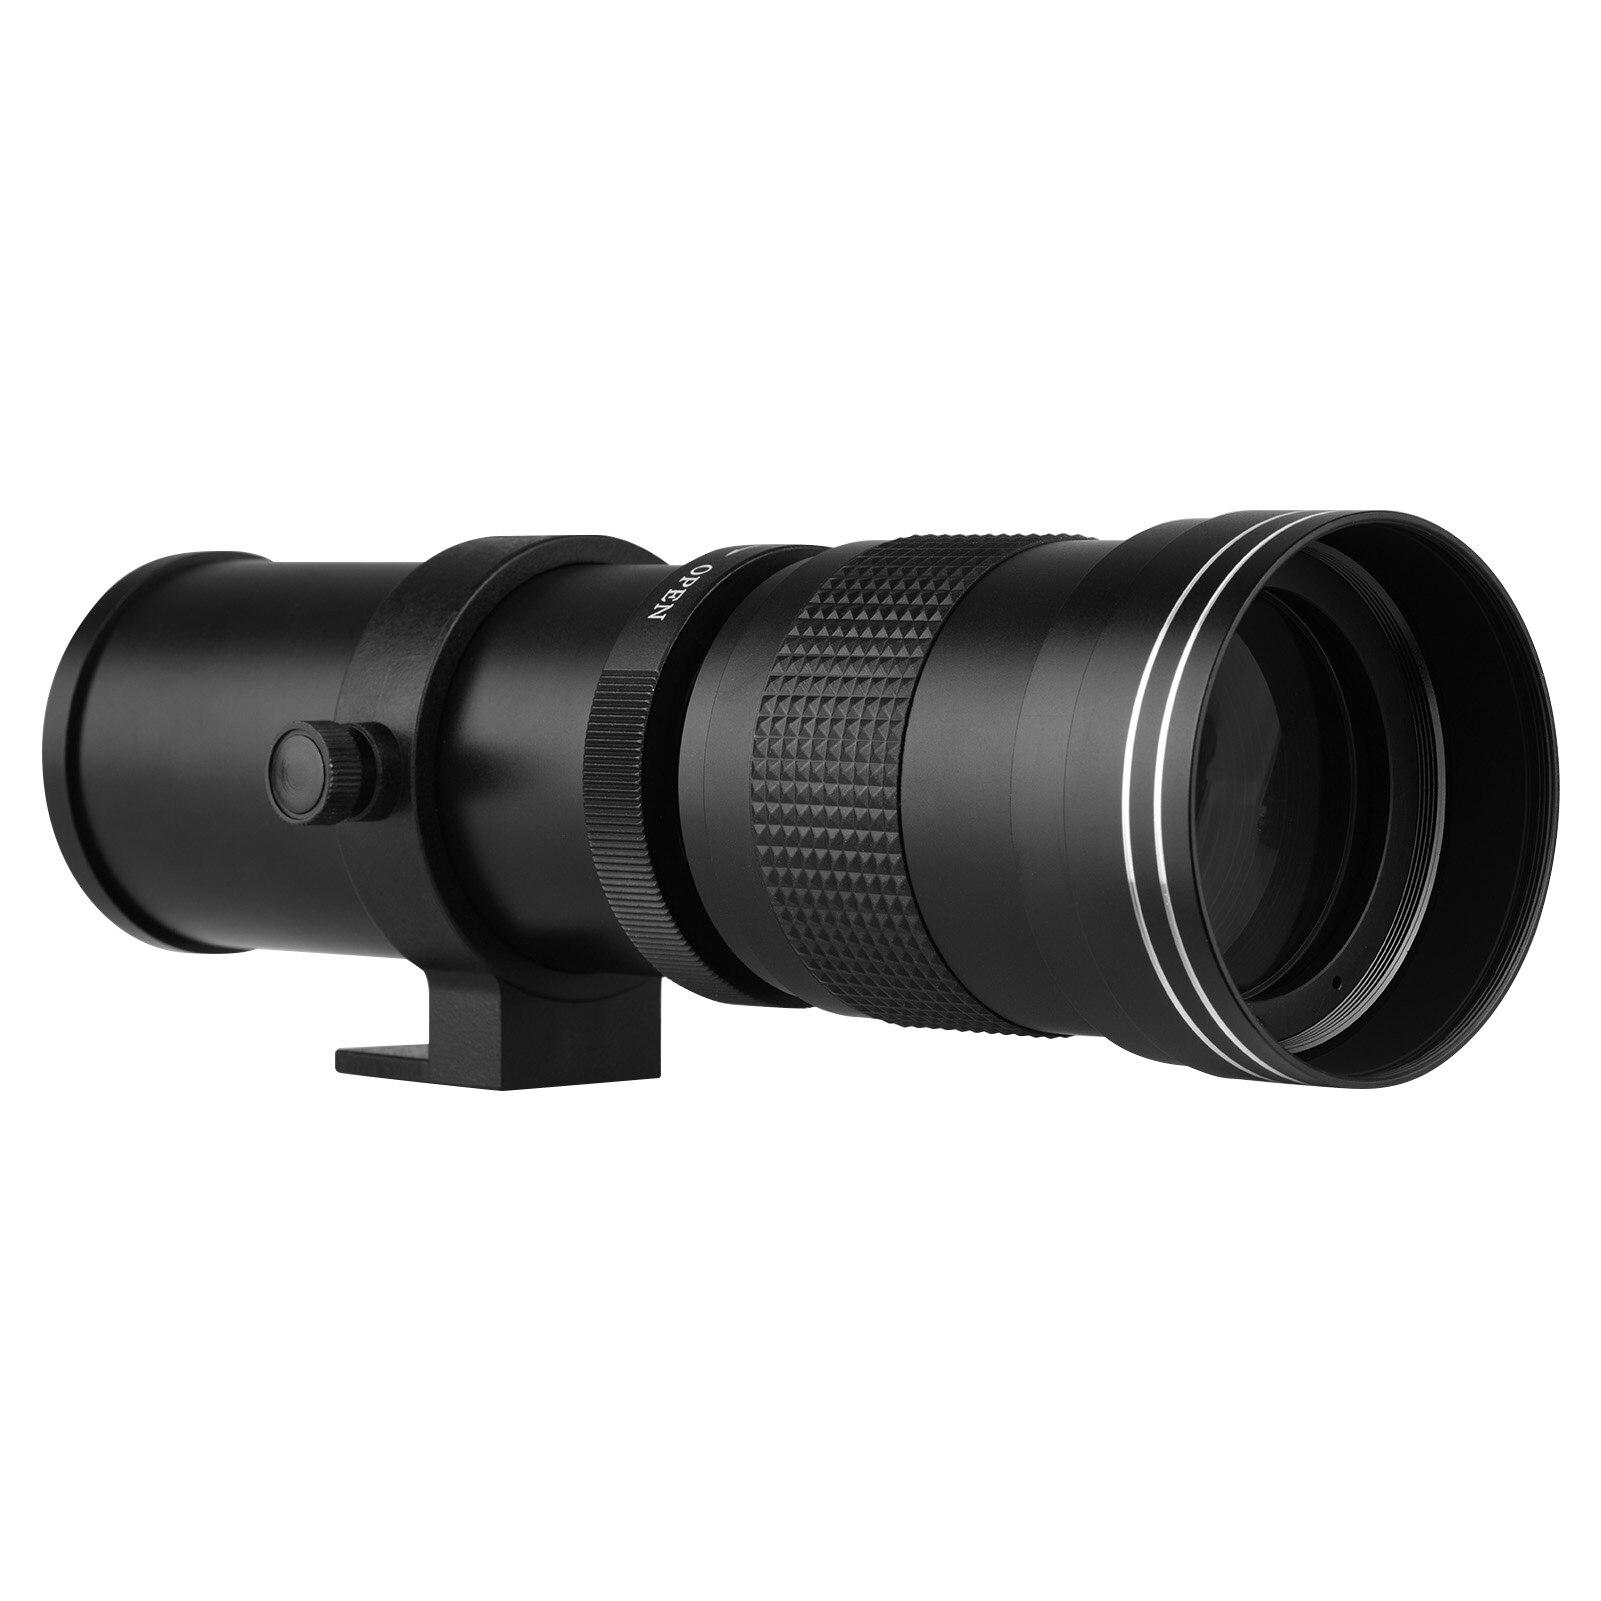 Teleobjetivo 420-800mm F/8,3-16 a precio de risa